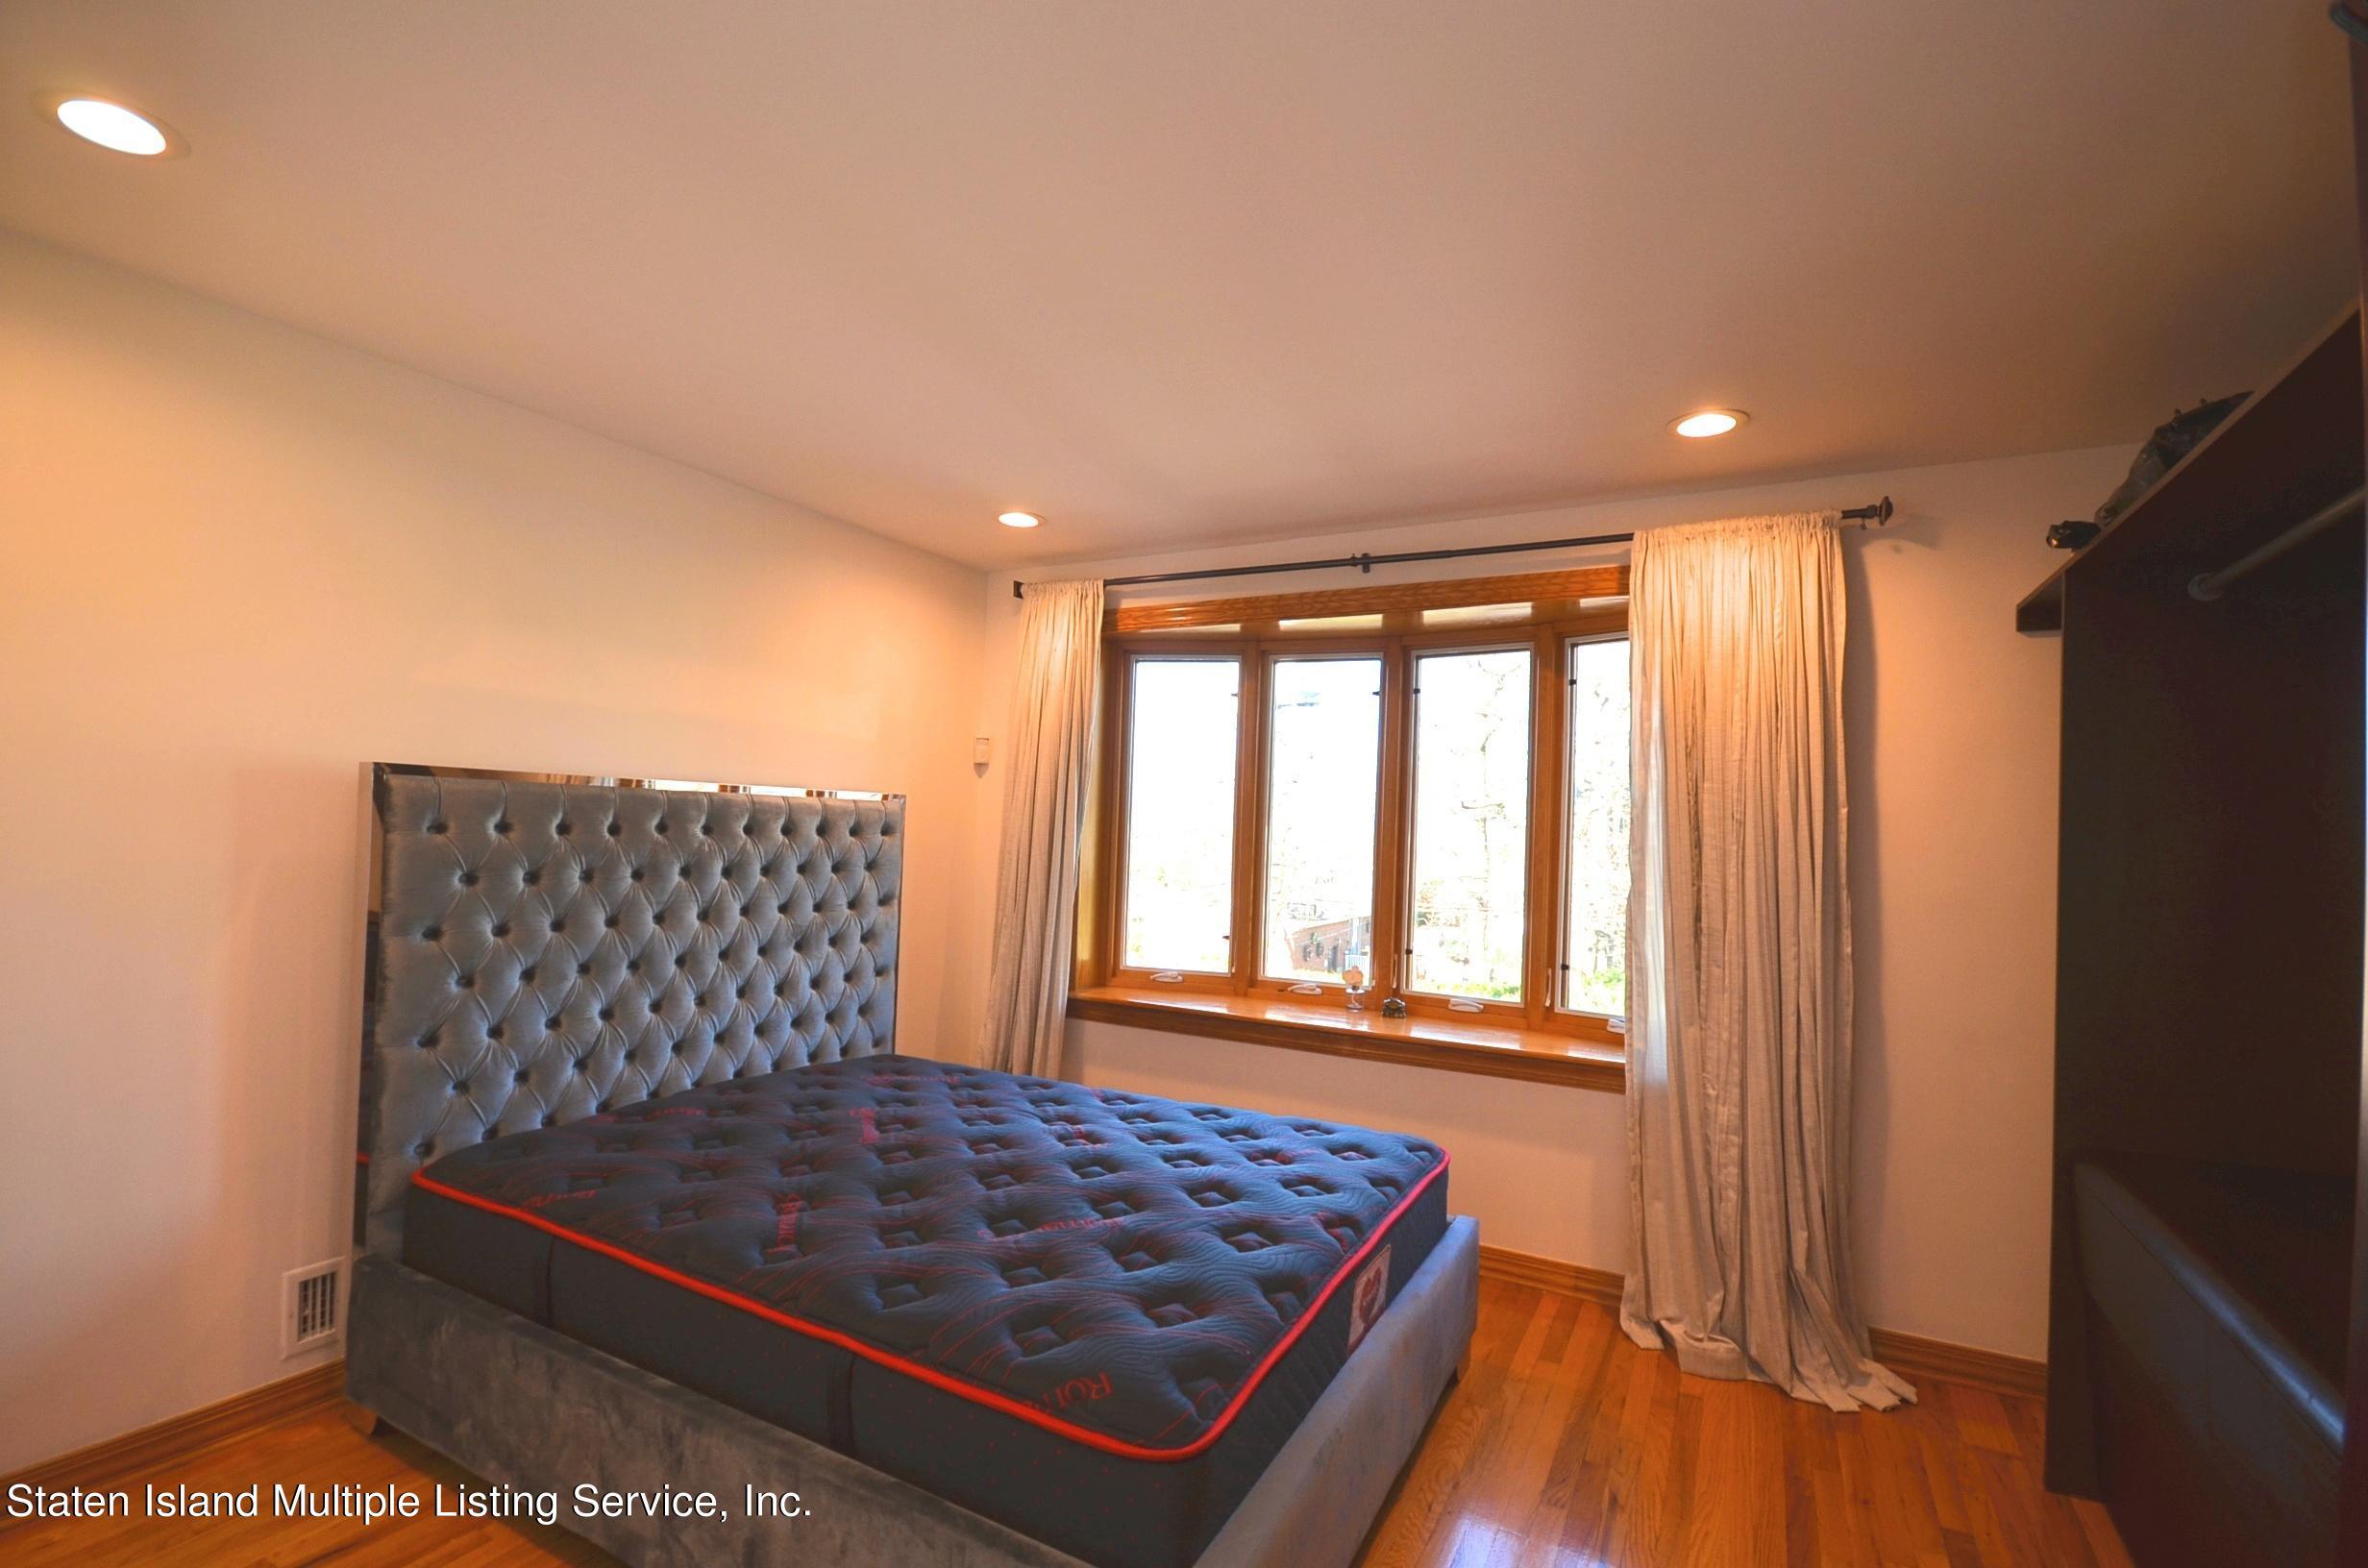 Single Family - Detached 48 Ocean Terrace  Staten Island, NY 10314, MLS-1142240-22